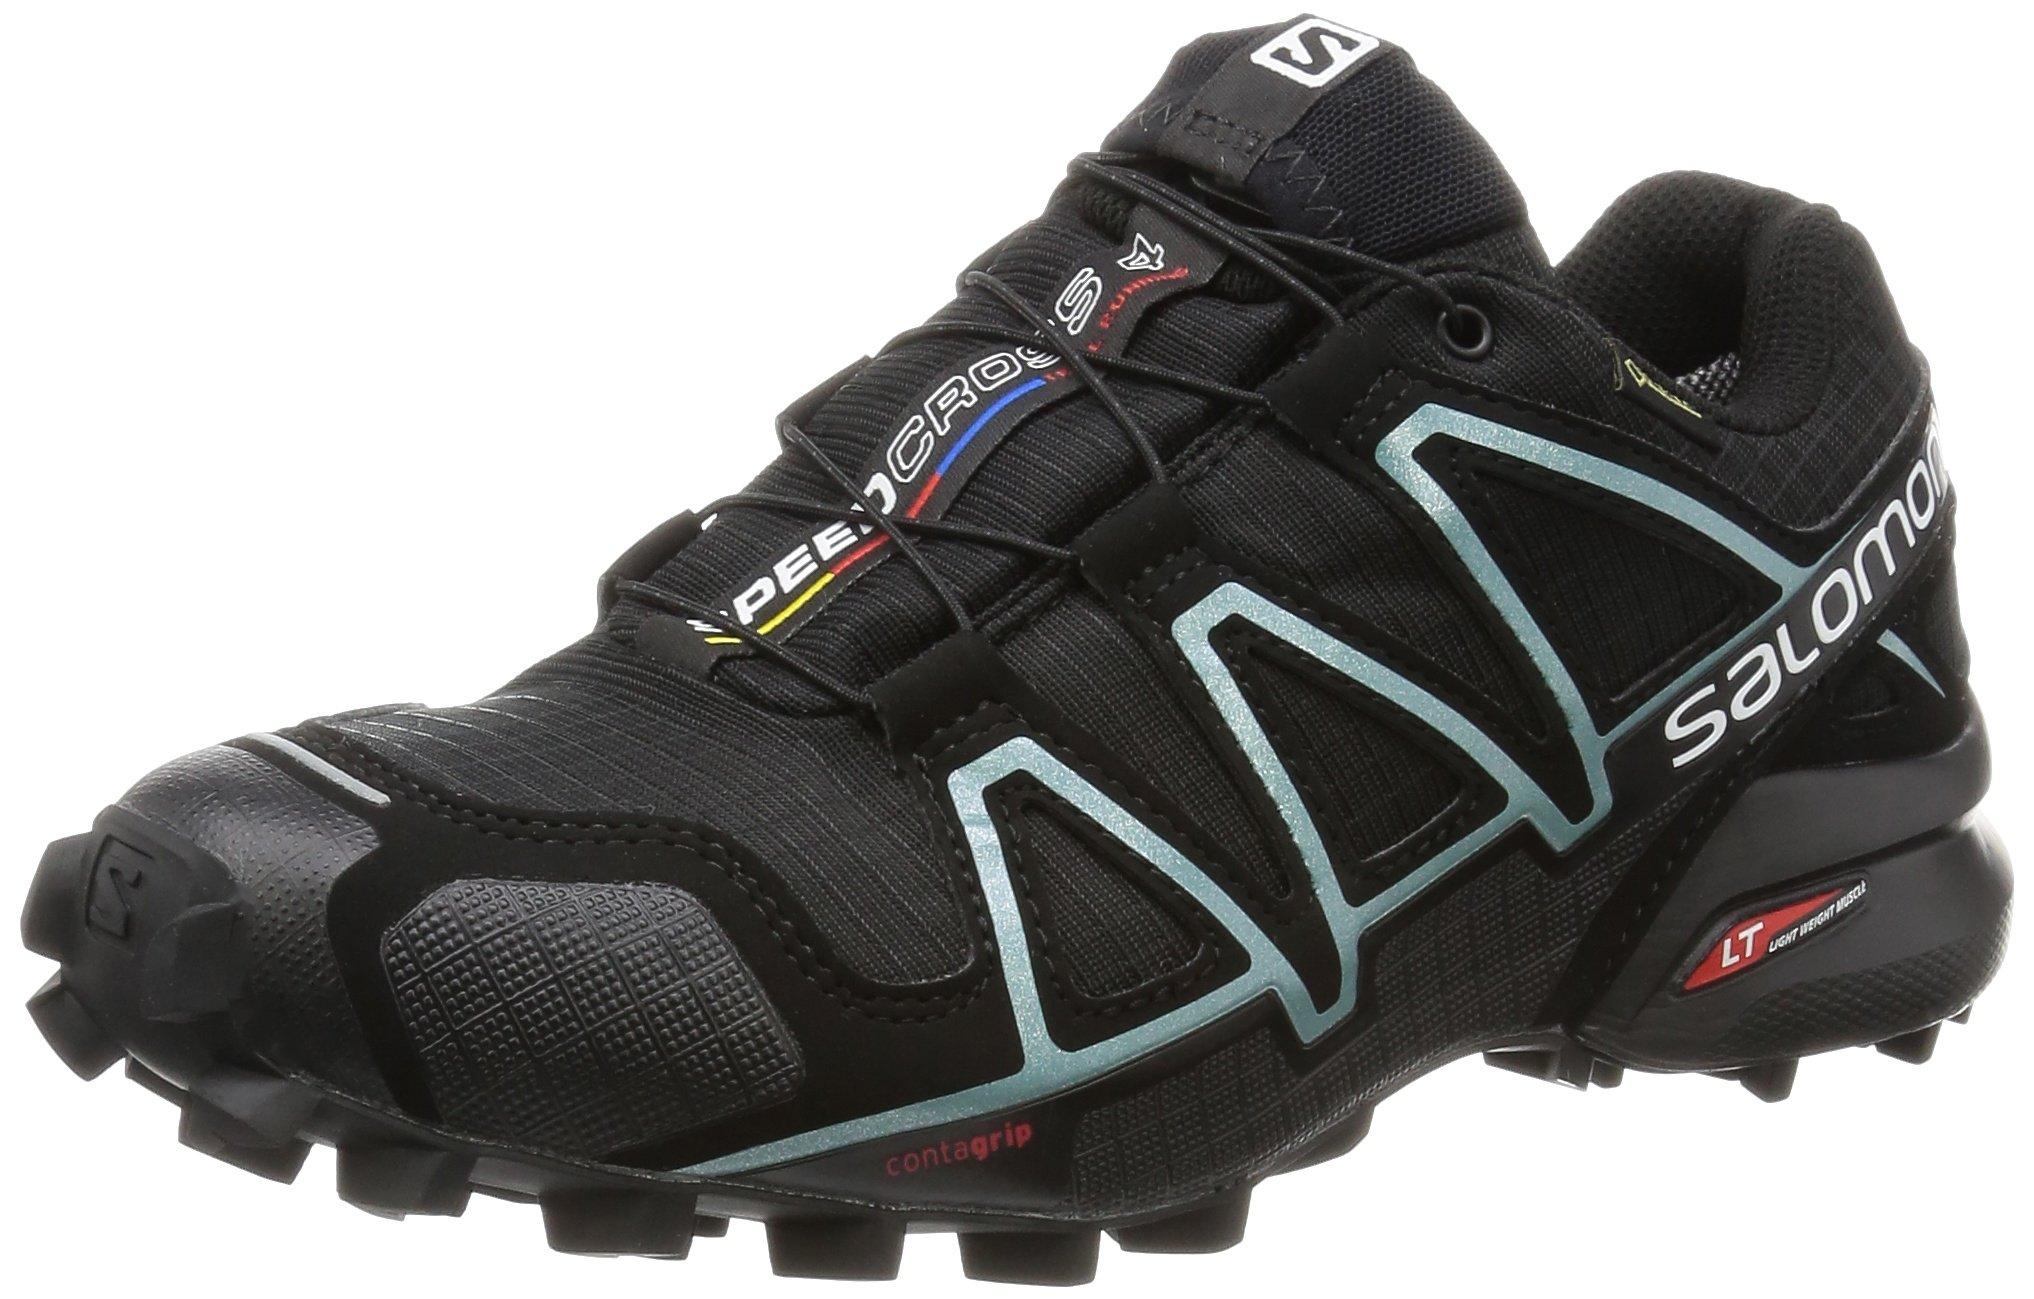 Salomon Women's SPEEDCROSS 4 GTX W Athletic Shoe, black, 8 M US